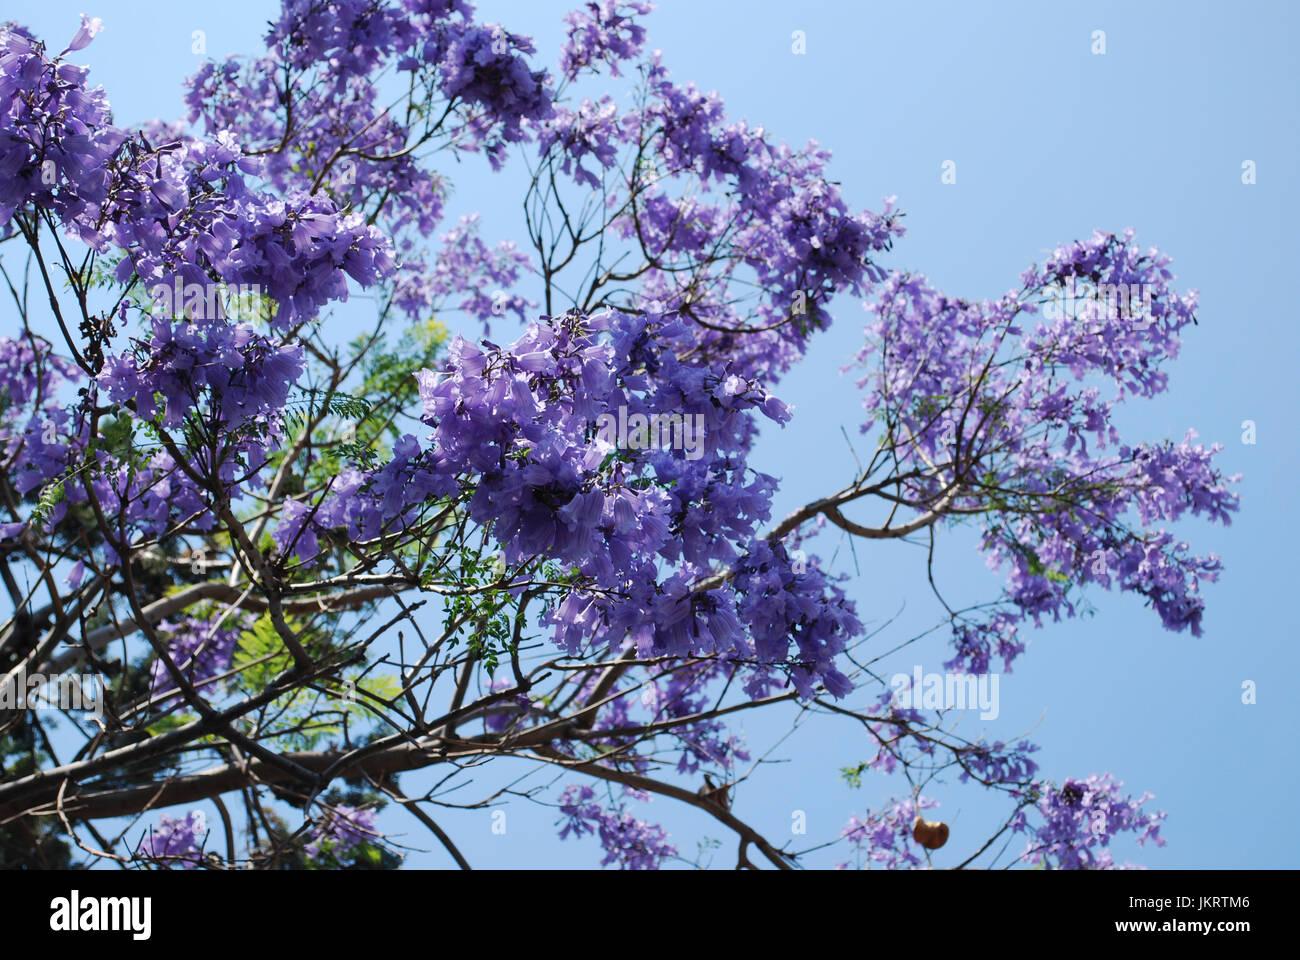 Jacaranda mimosifolia trees blue flowers blossom stock photo jacaranda mimosifolia trees blue flowers blossom izmirmasajfo